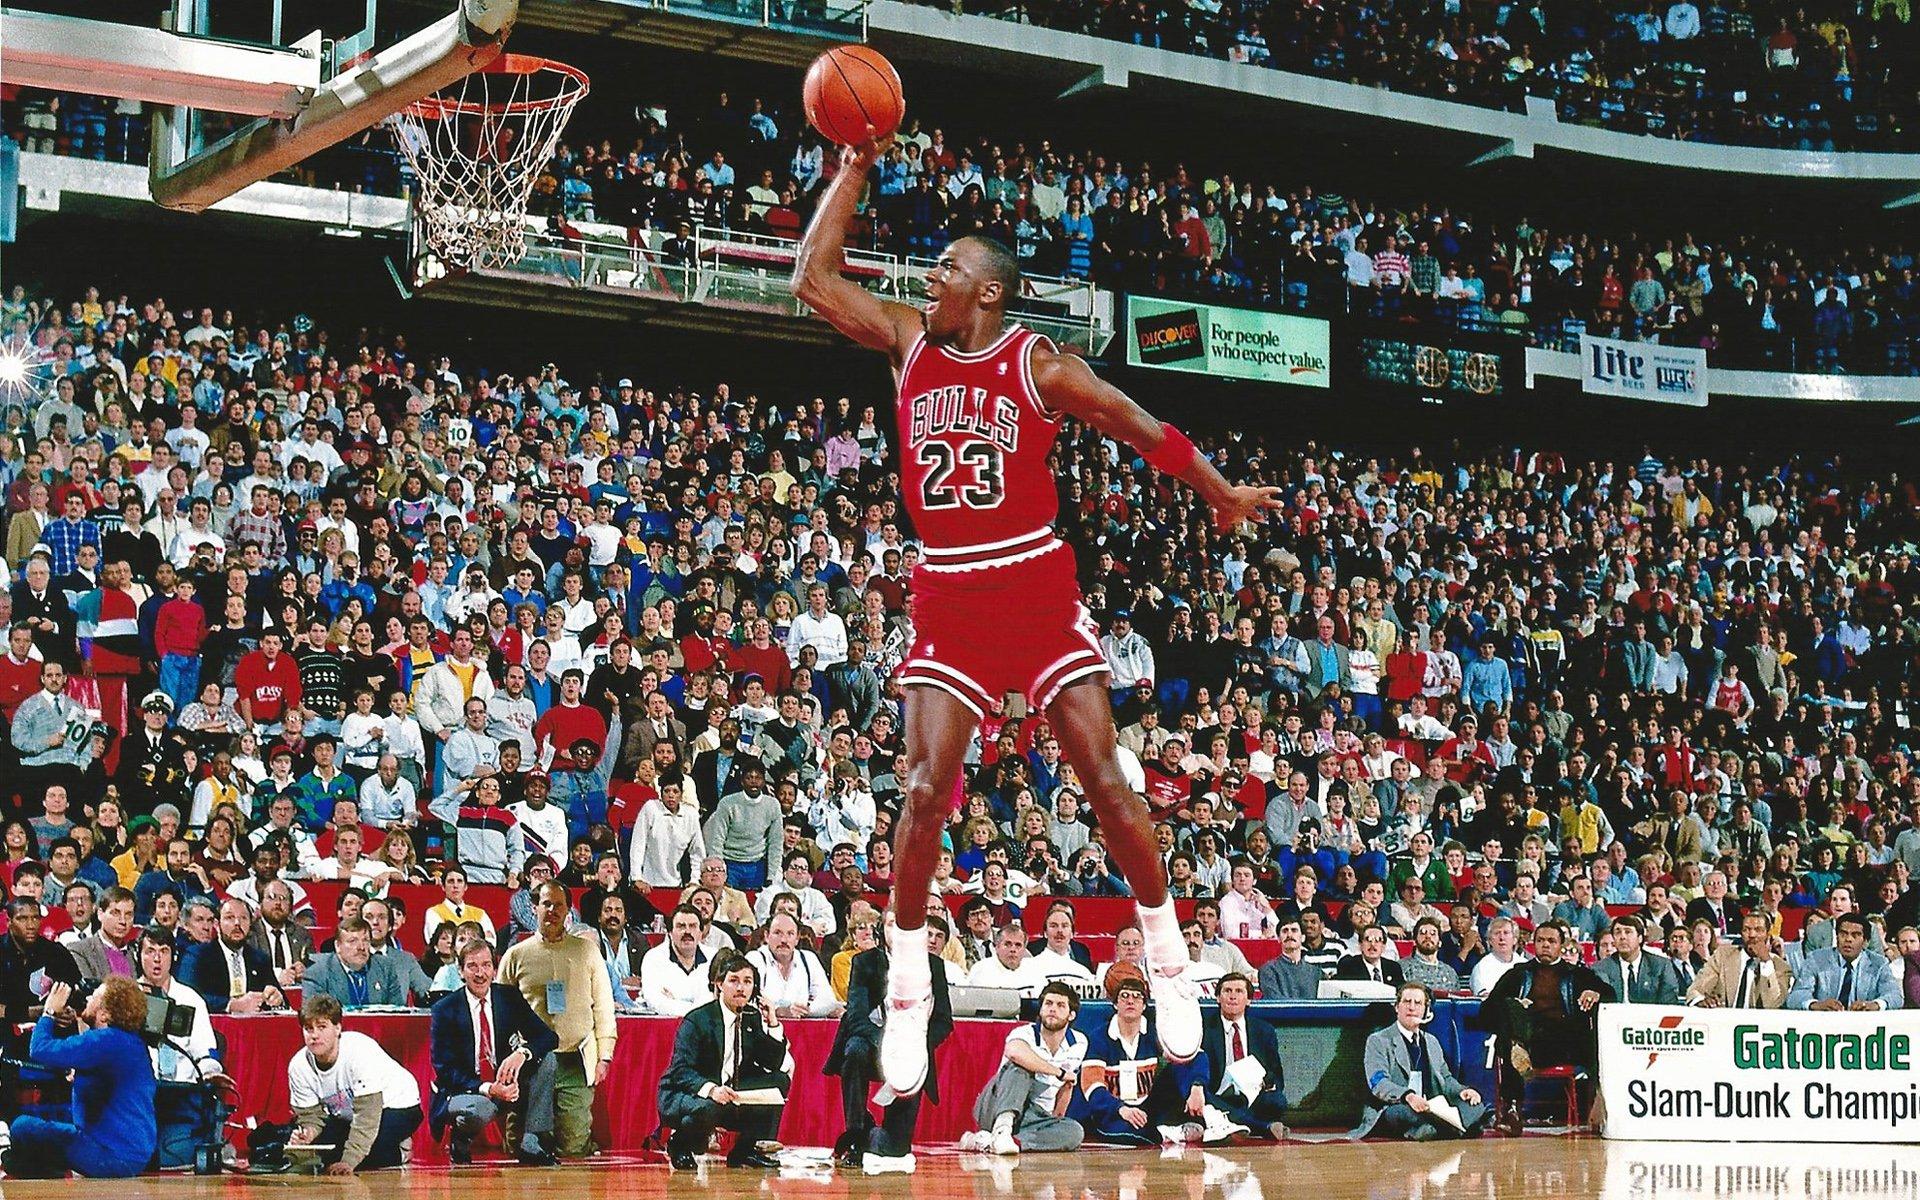 Michael Jordan Hd Pictures 112399 Hd Wallpaper Backgrounds